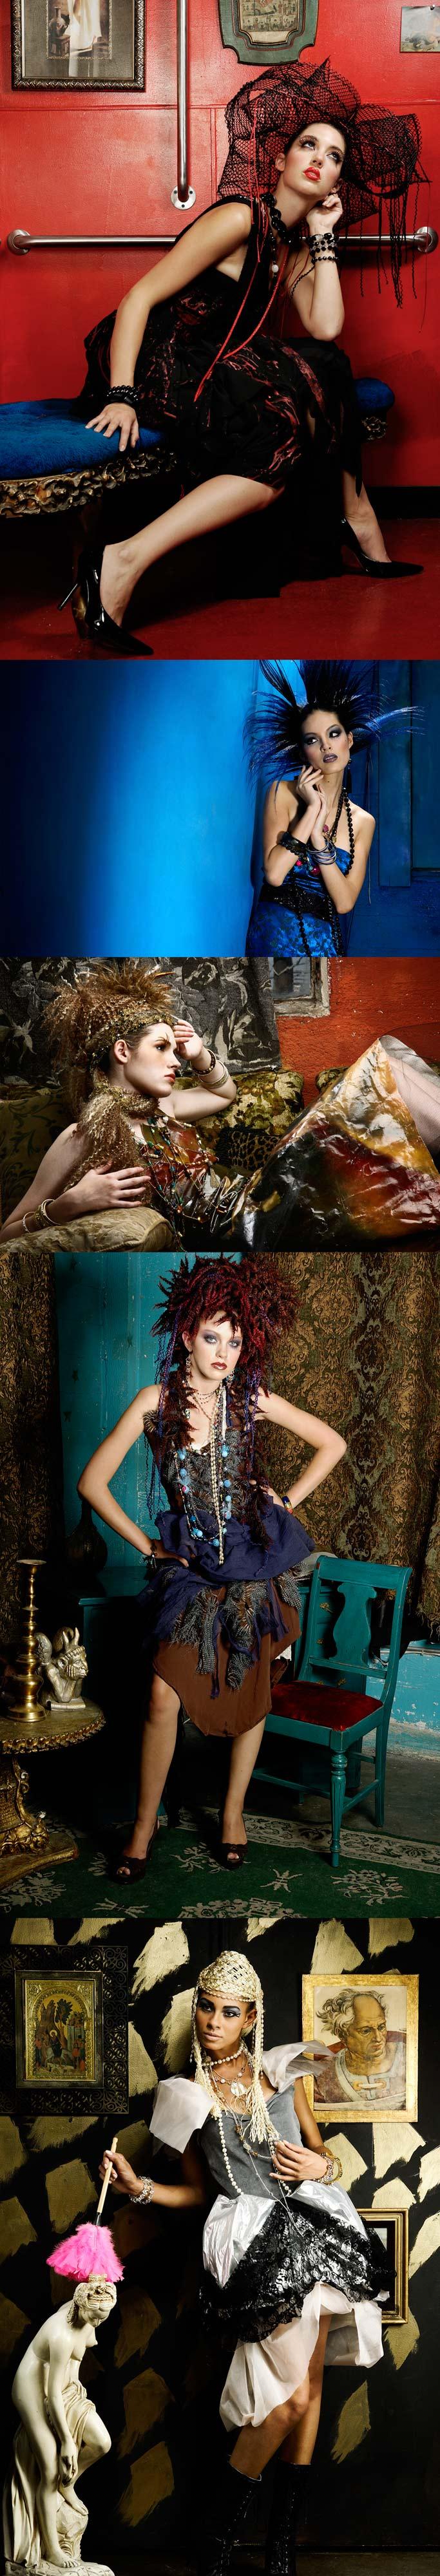 Oct 17, 2007 Casa de la Mode - Story by Michael Hall